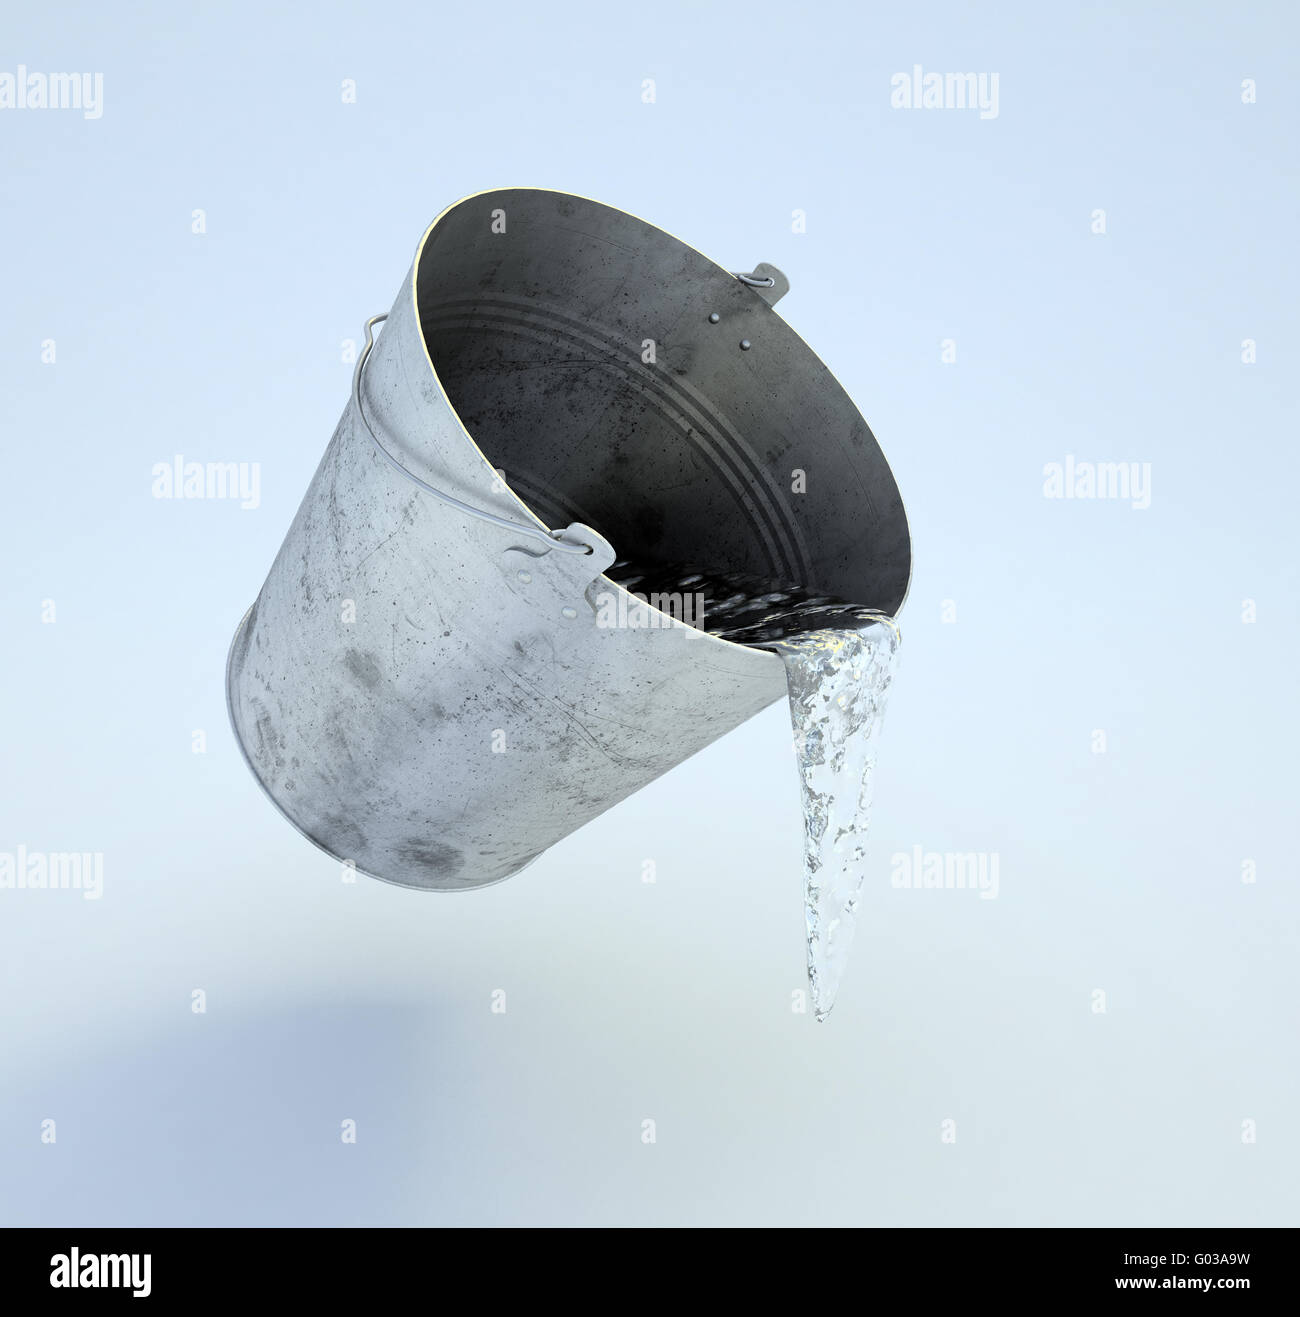 metal bucket full of water levitating over the floor - Stock Image